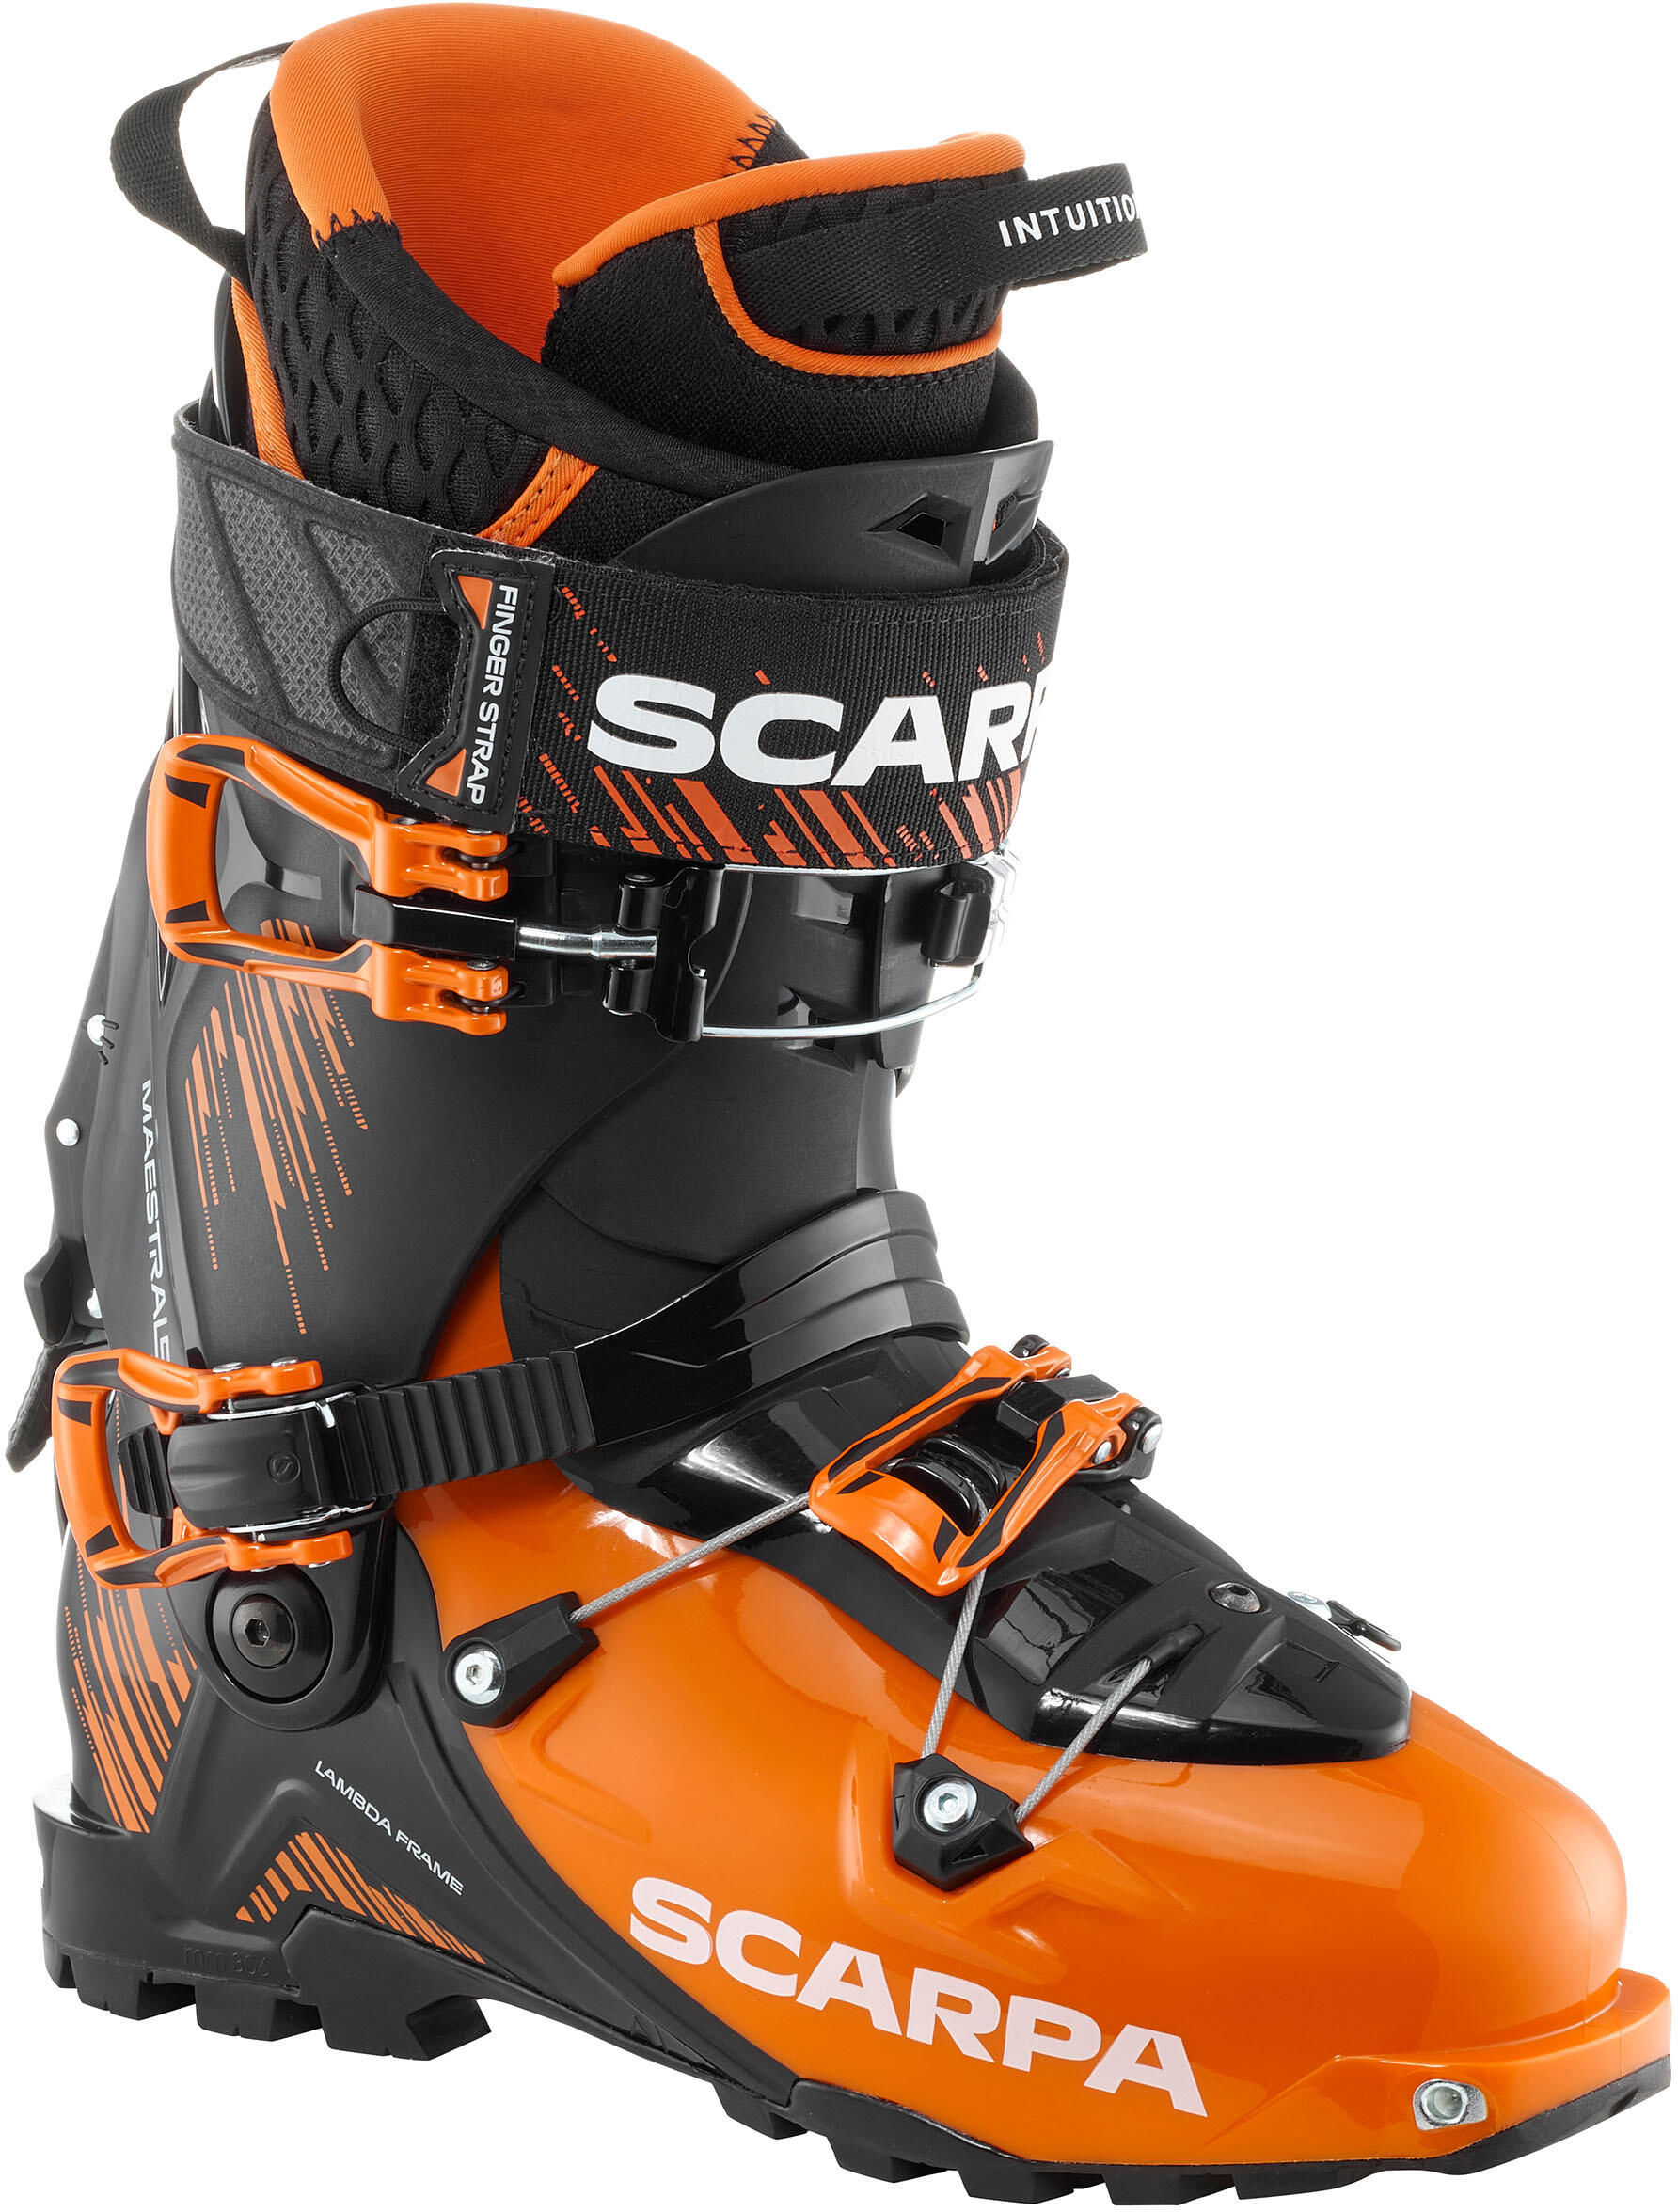 Buty skiturowe Scarpa Maestrale 21-22